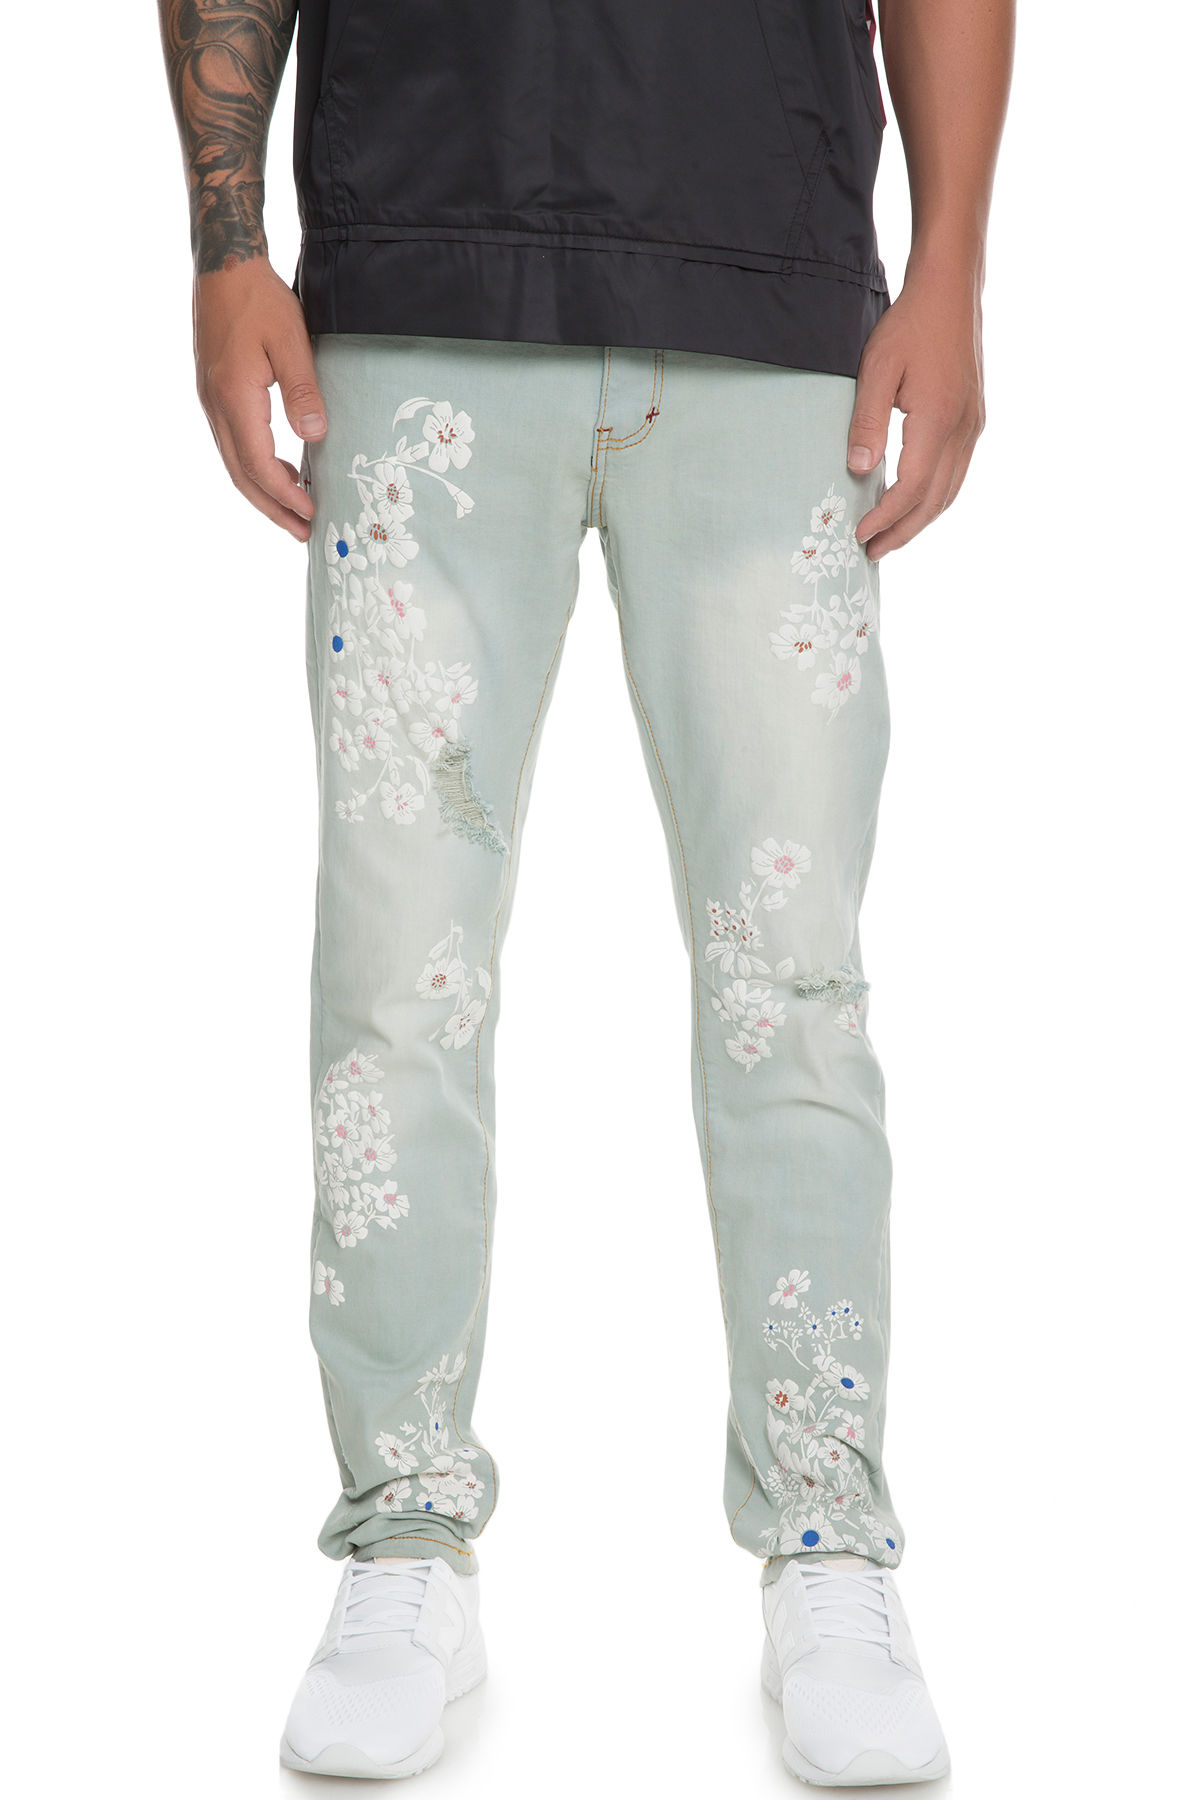 Image of The Cria Denim Jeans in Sandwash Floral